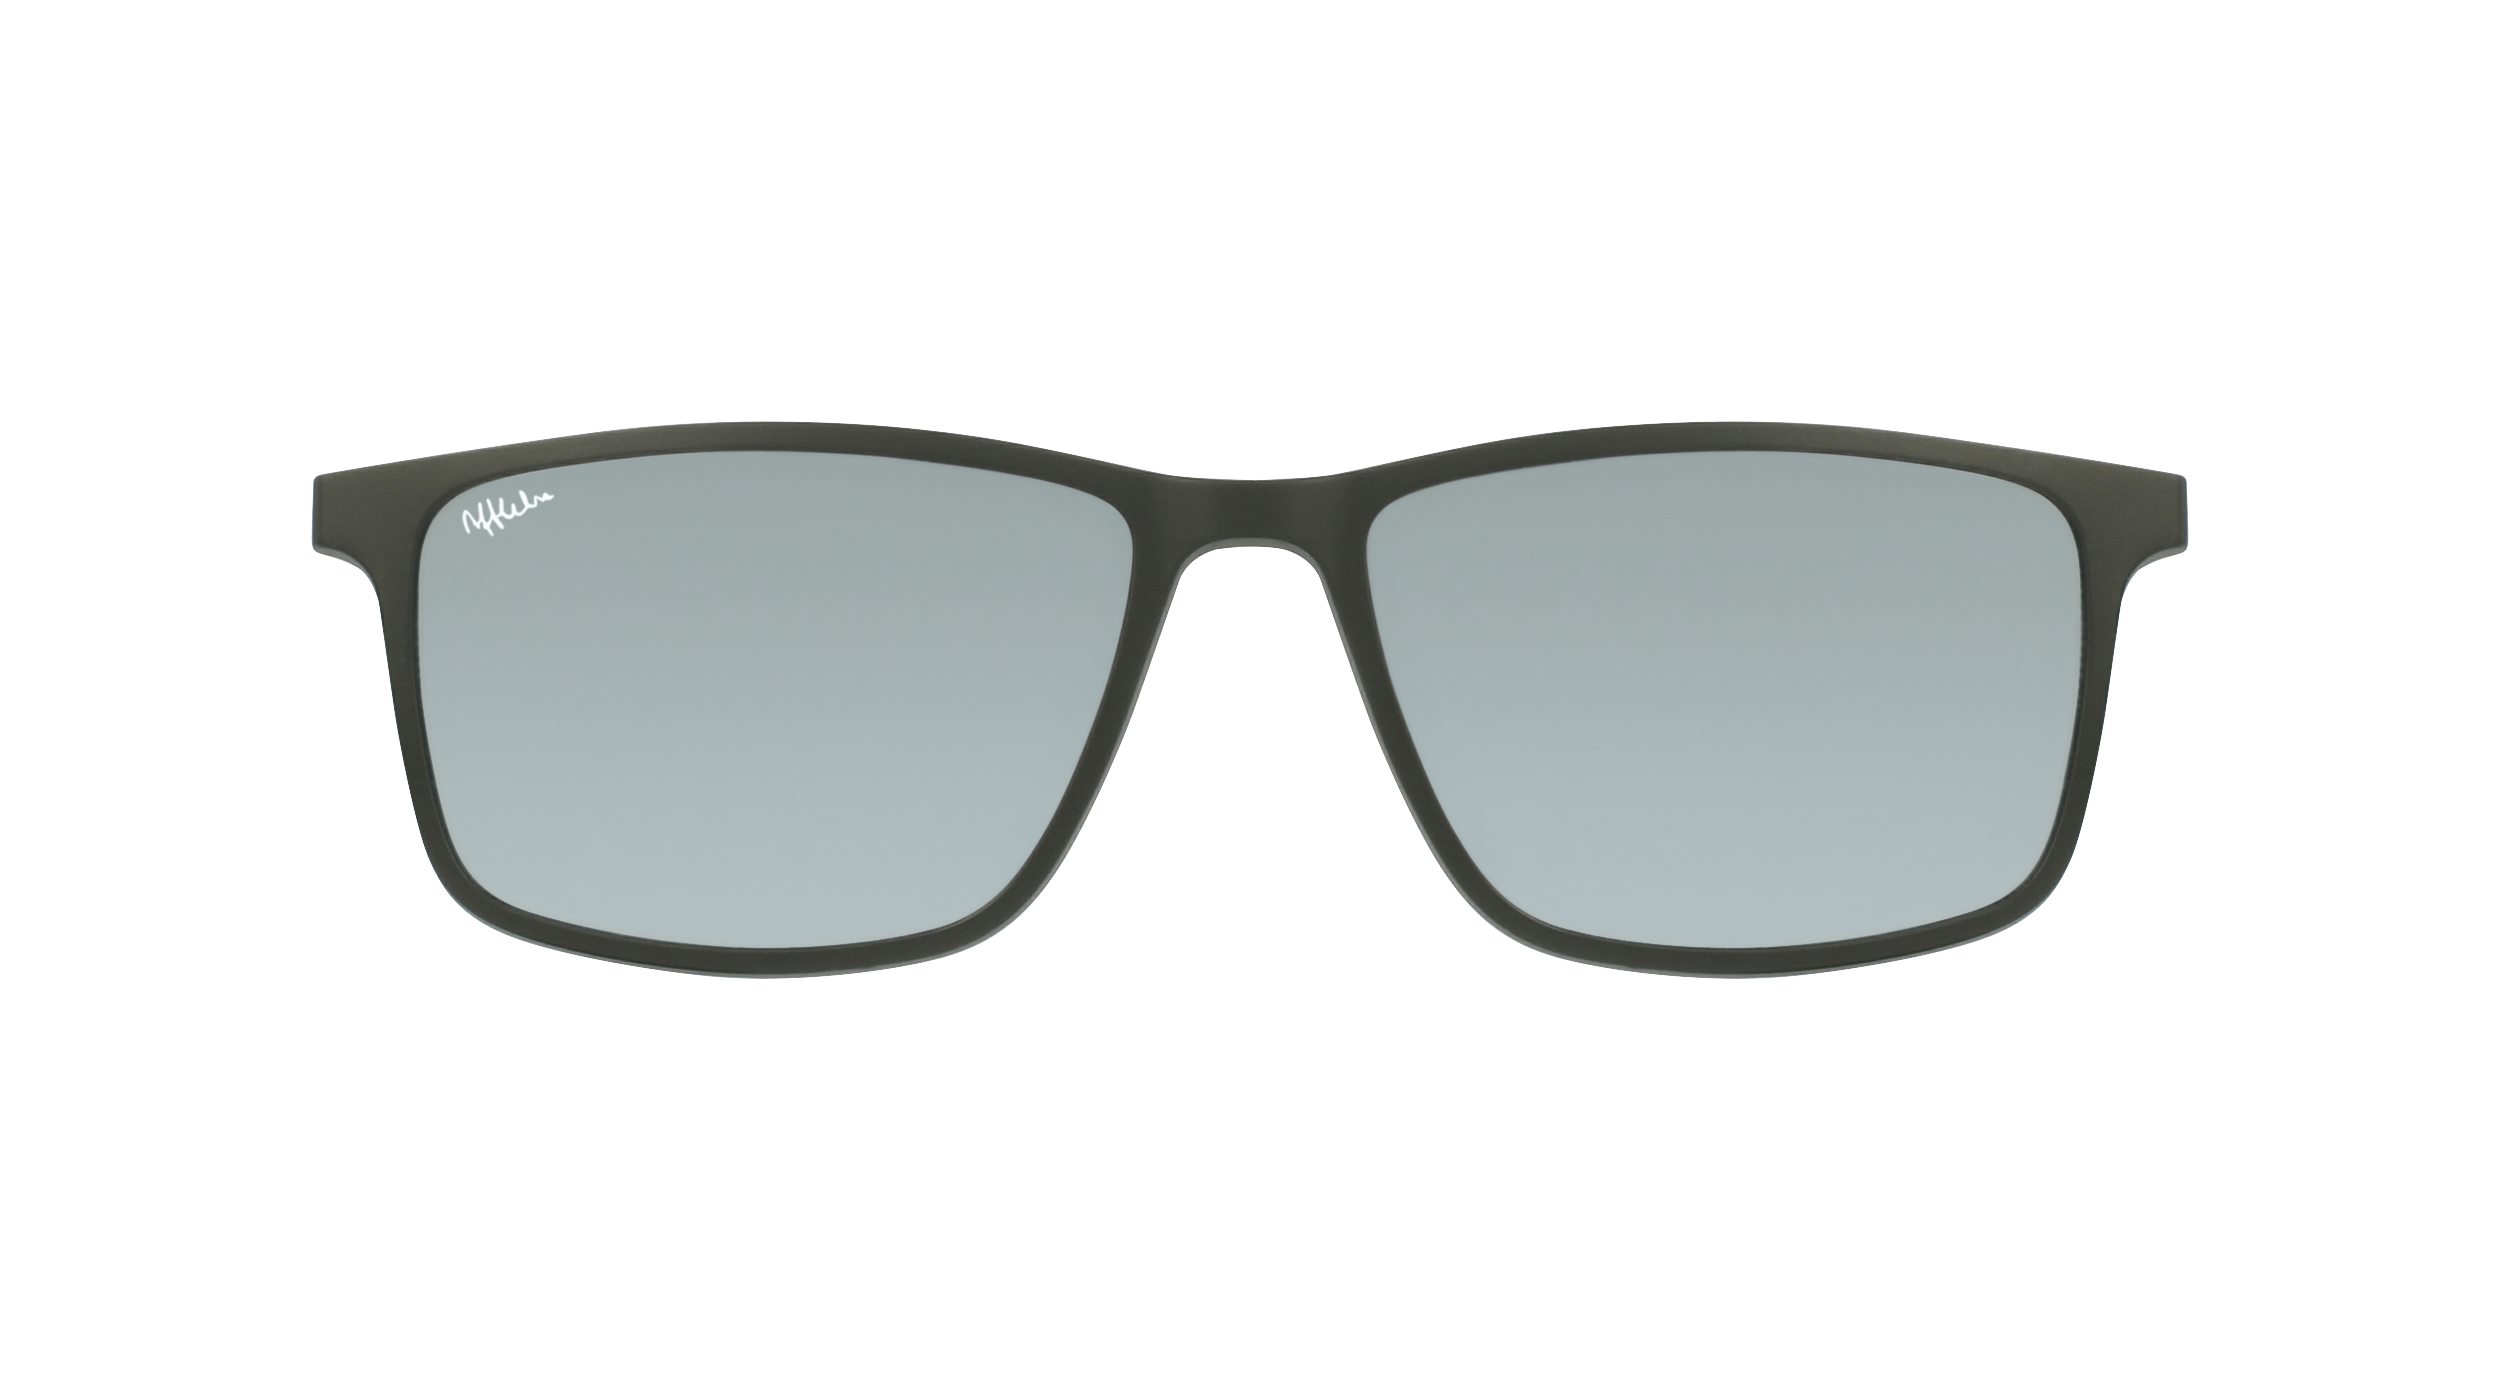 afflelou/france/products/smart_clip/clips_glasses/07630036457108.png